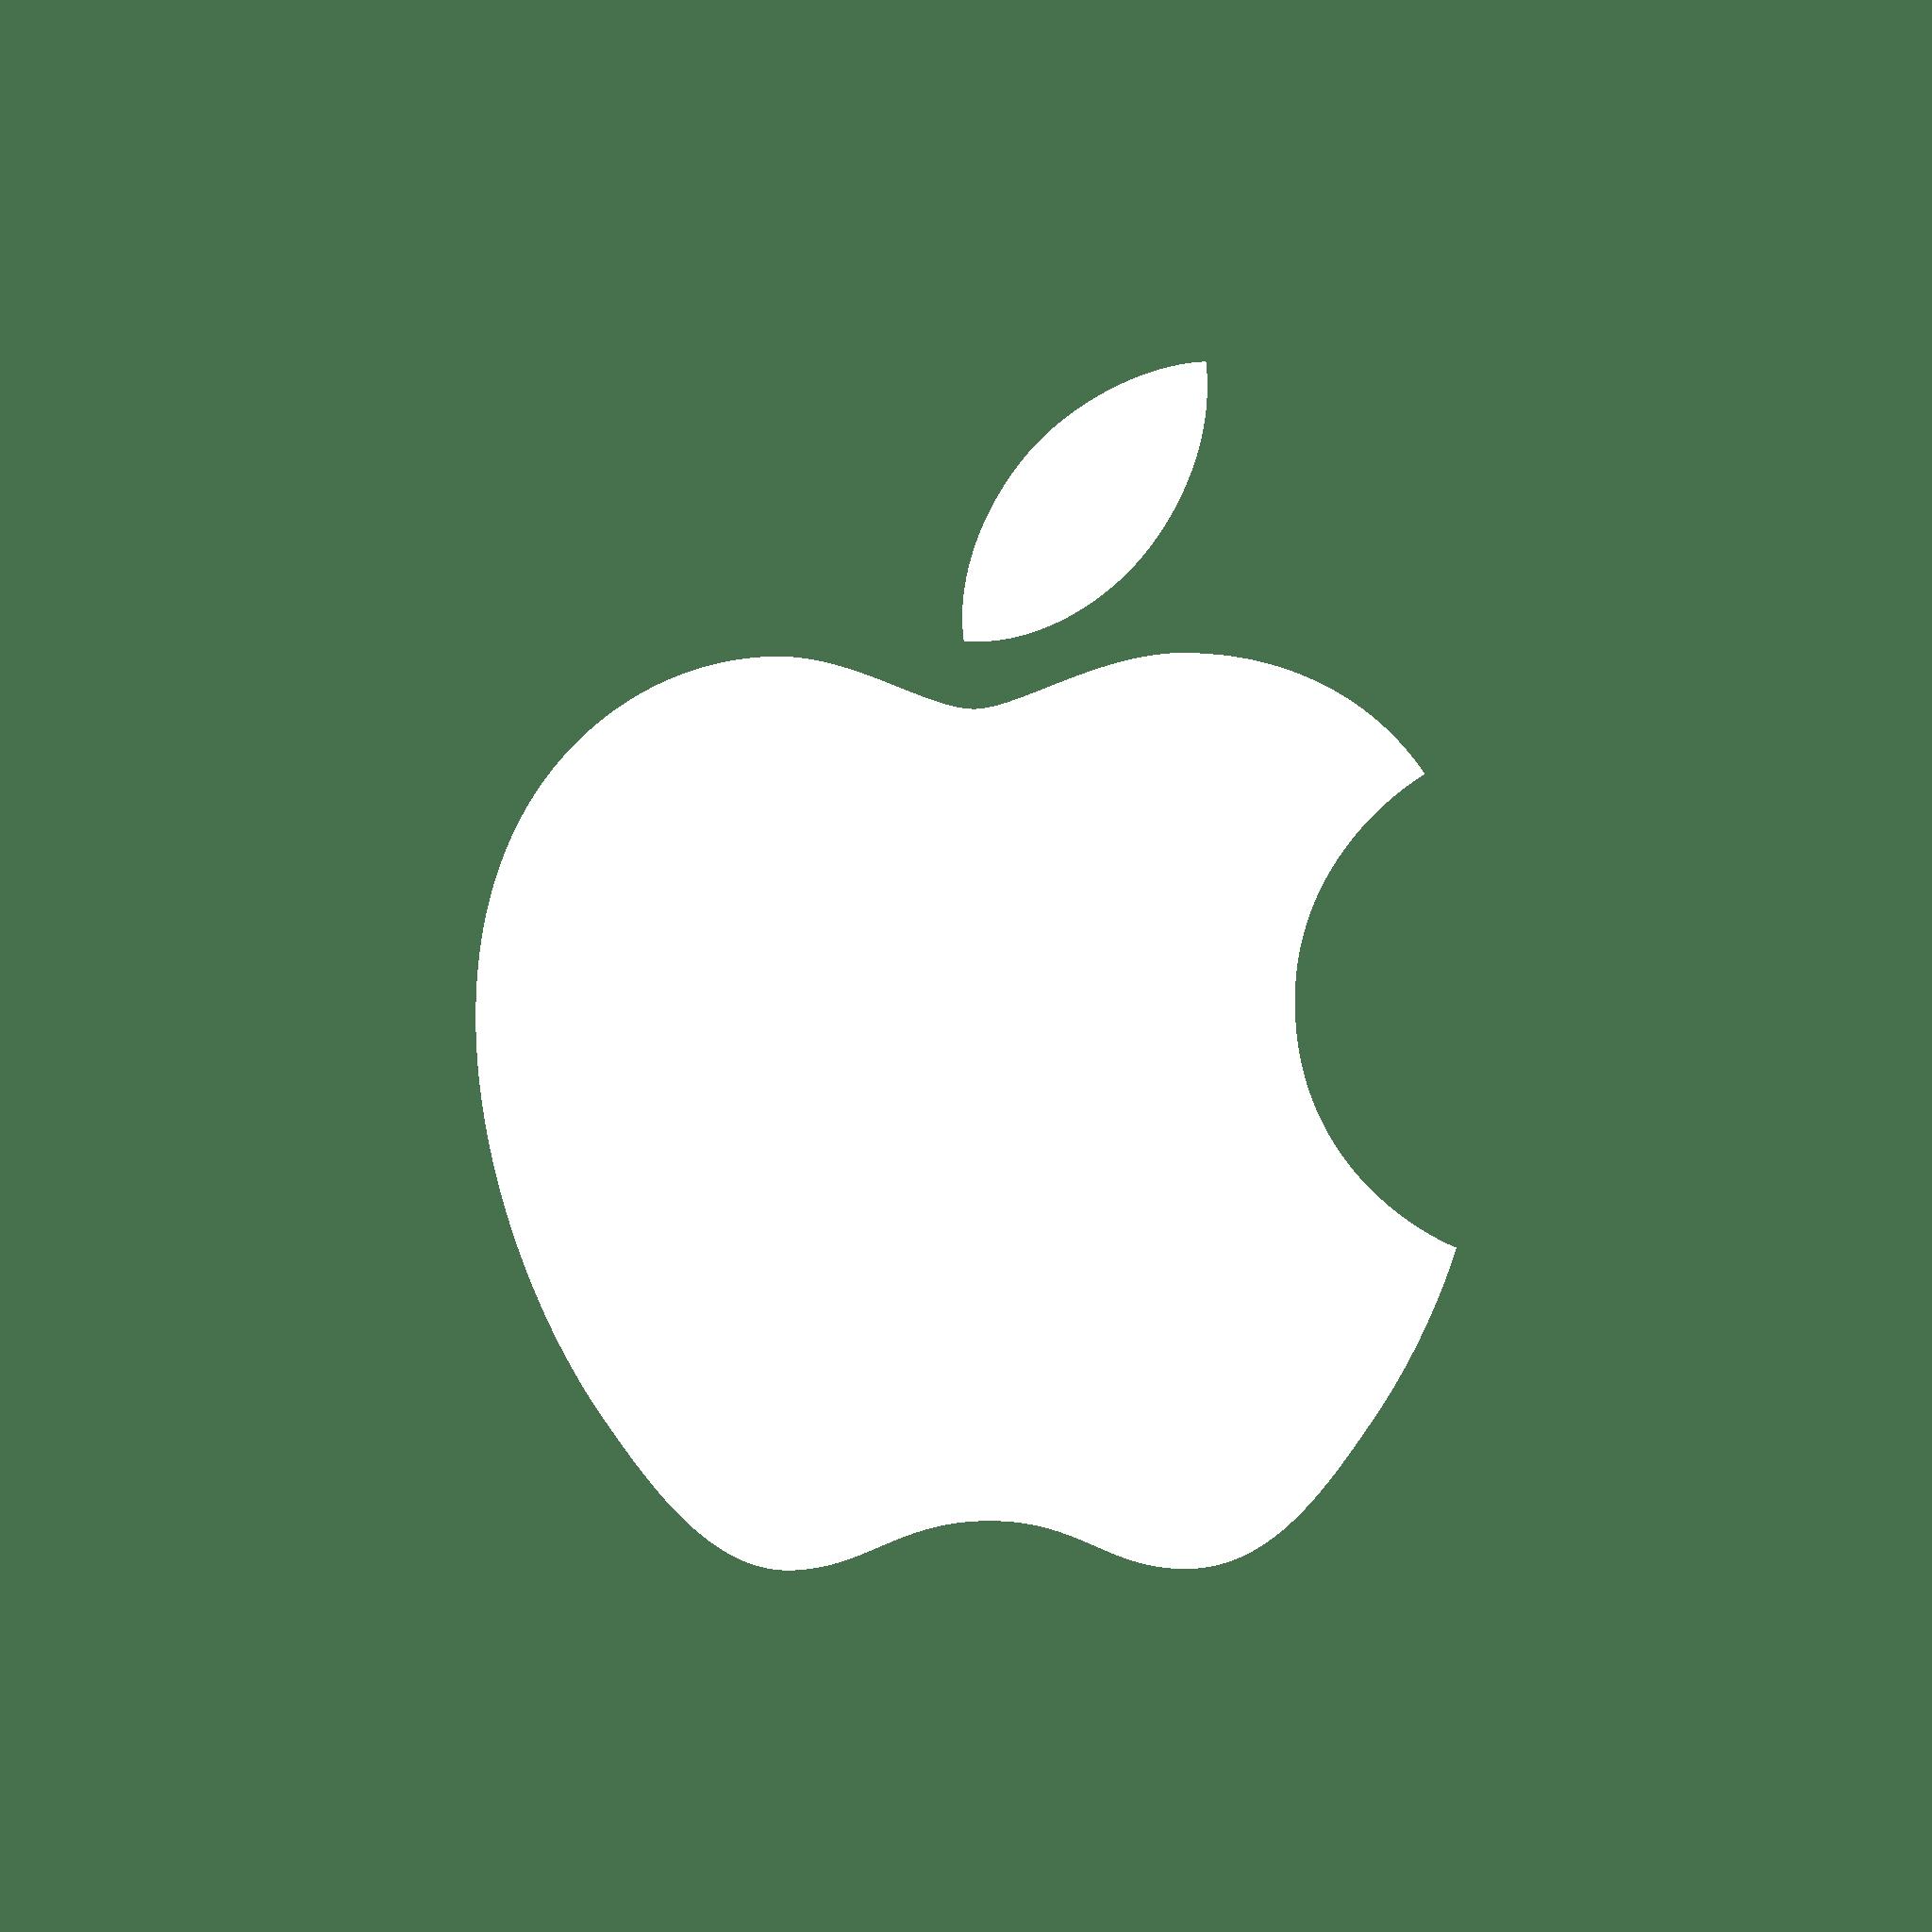 Cute Cartoon Family Wallpaper Apple Icon